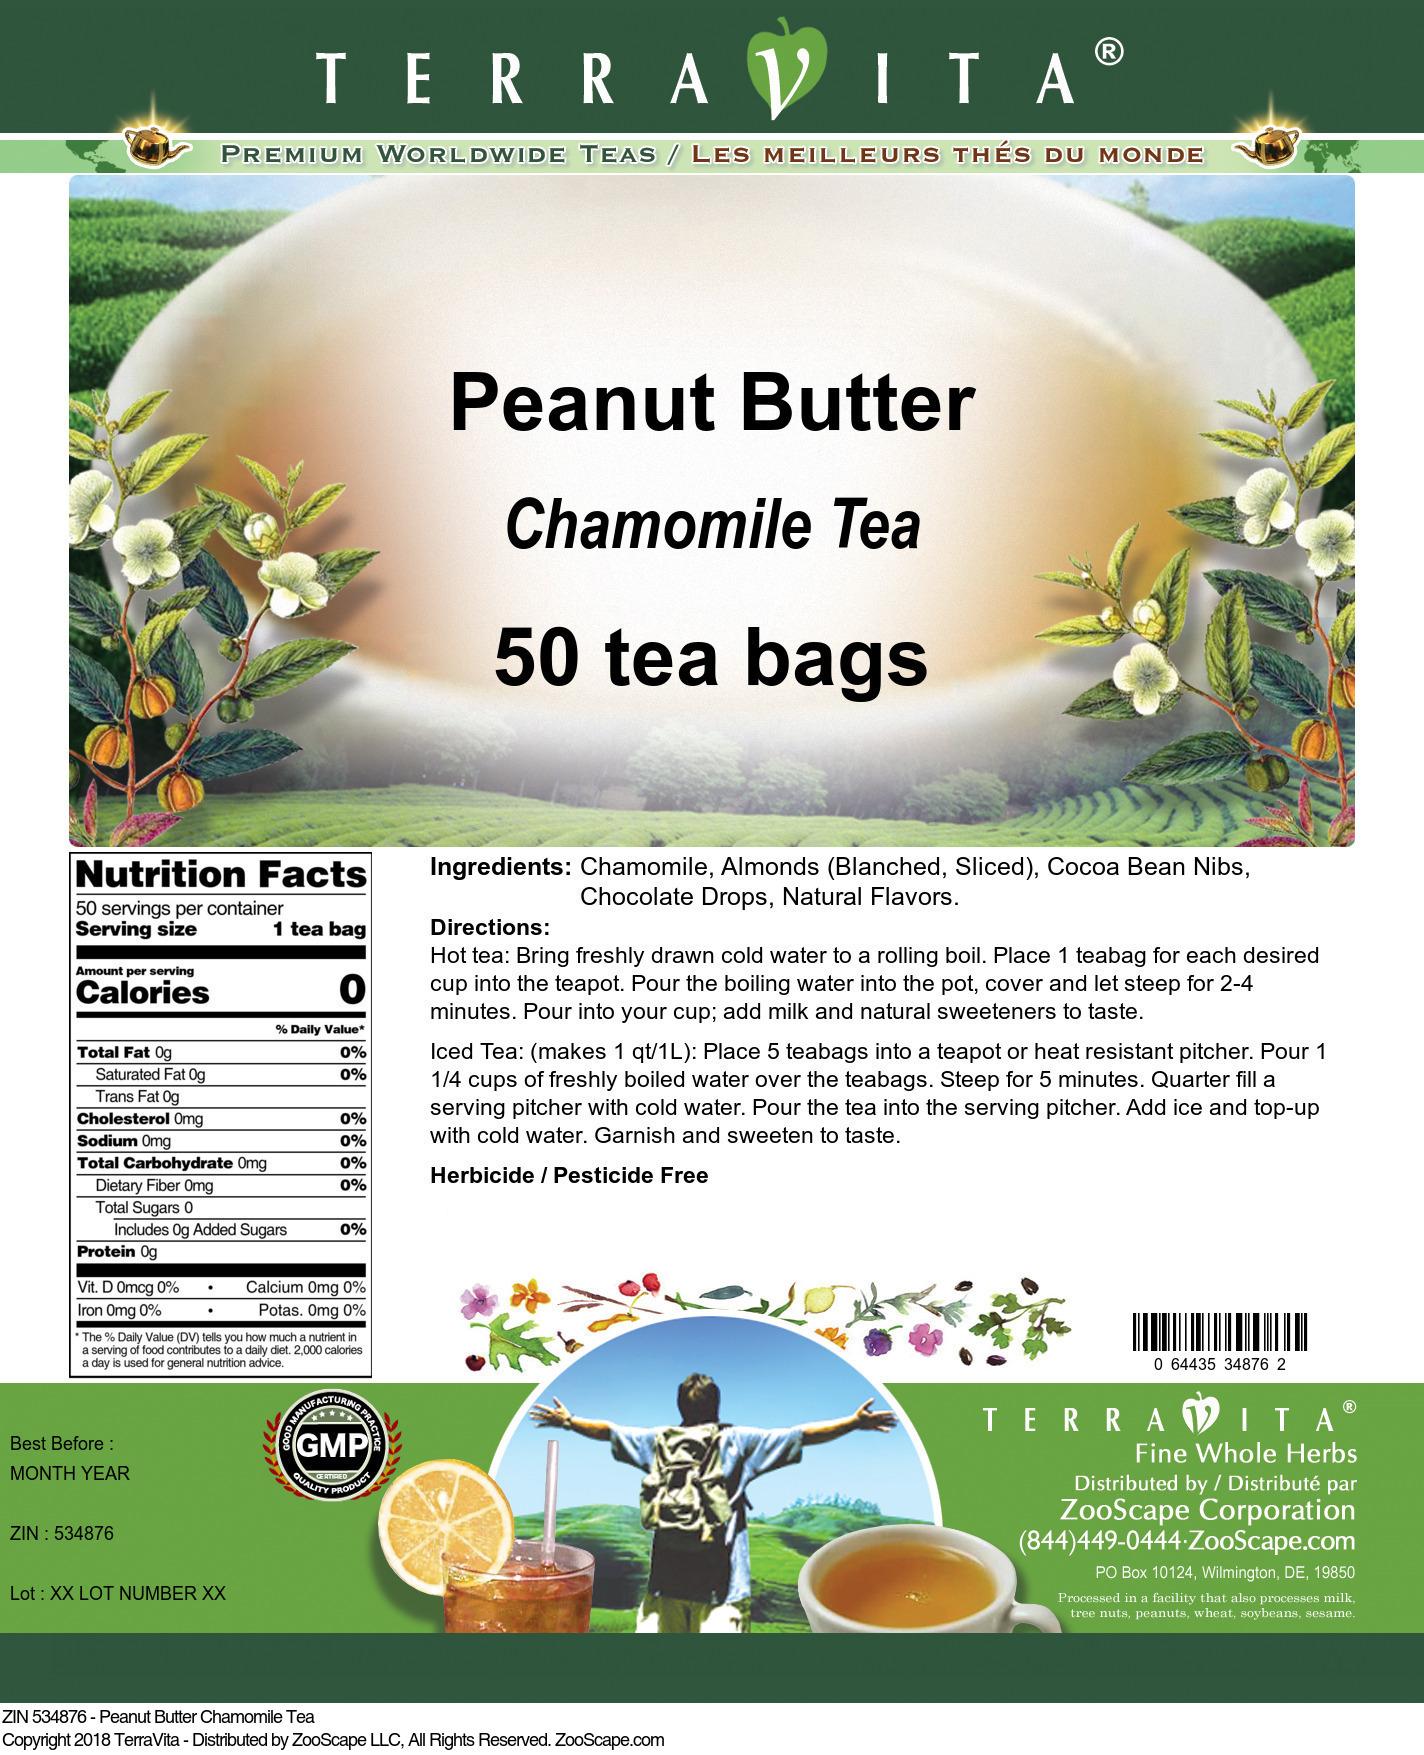 Peanut Butter Chamomile Tea